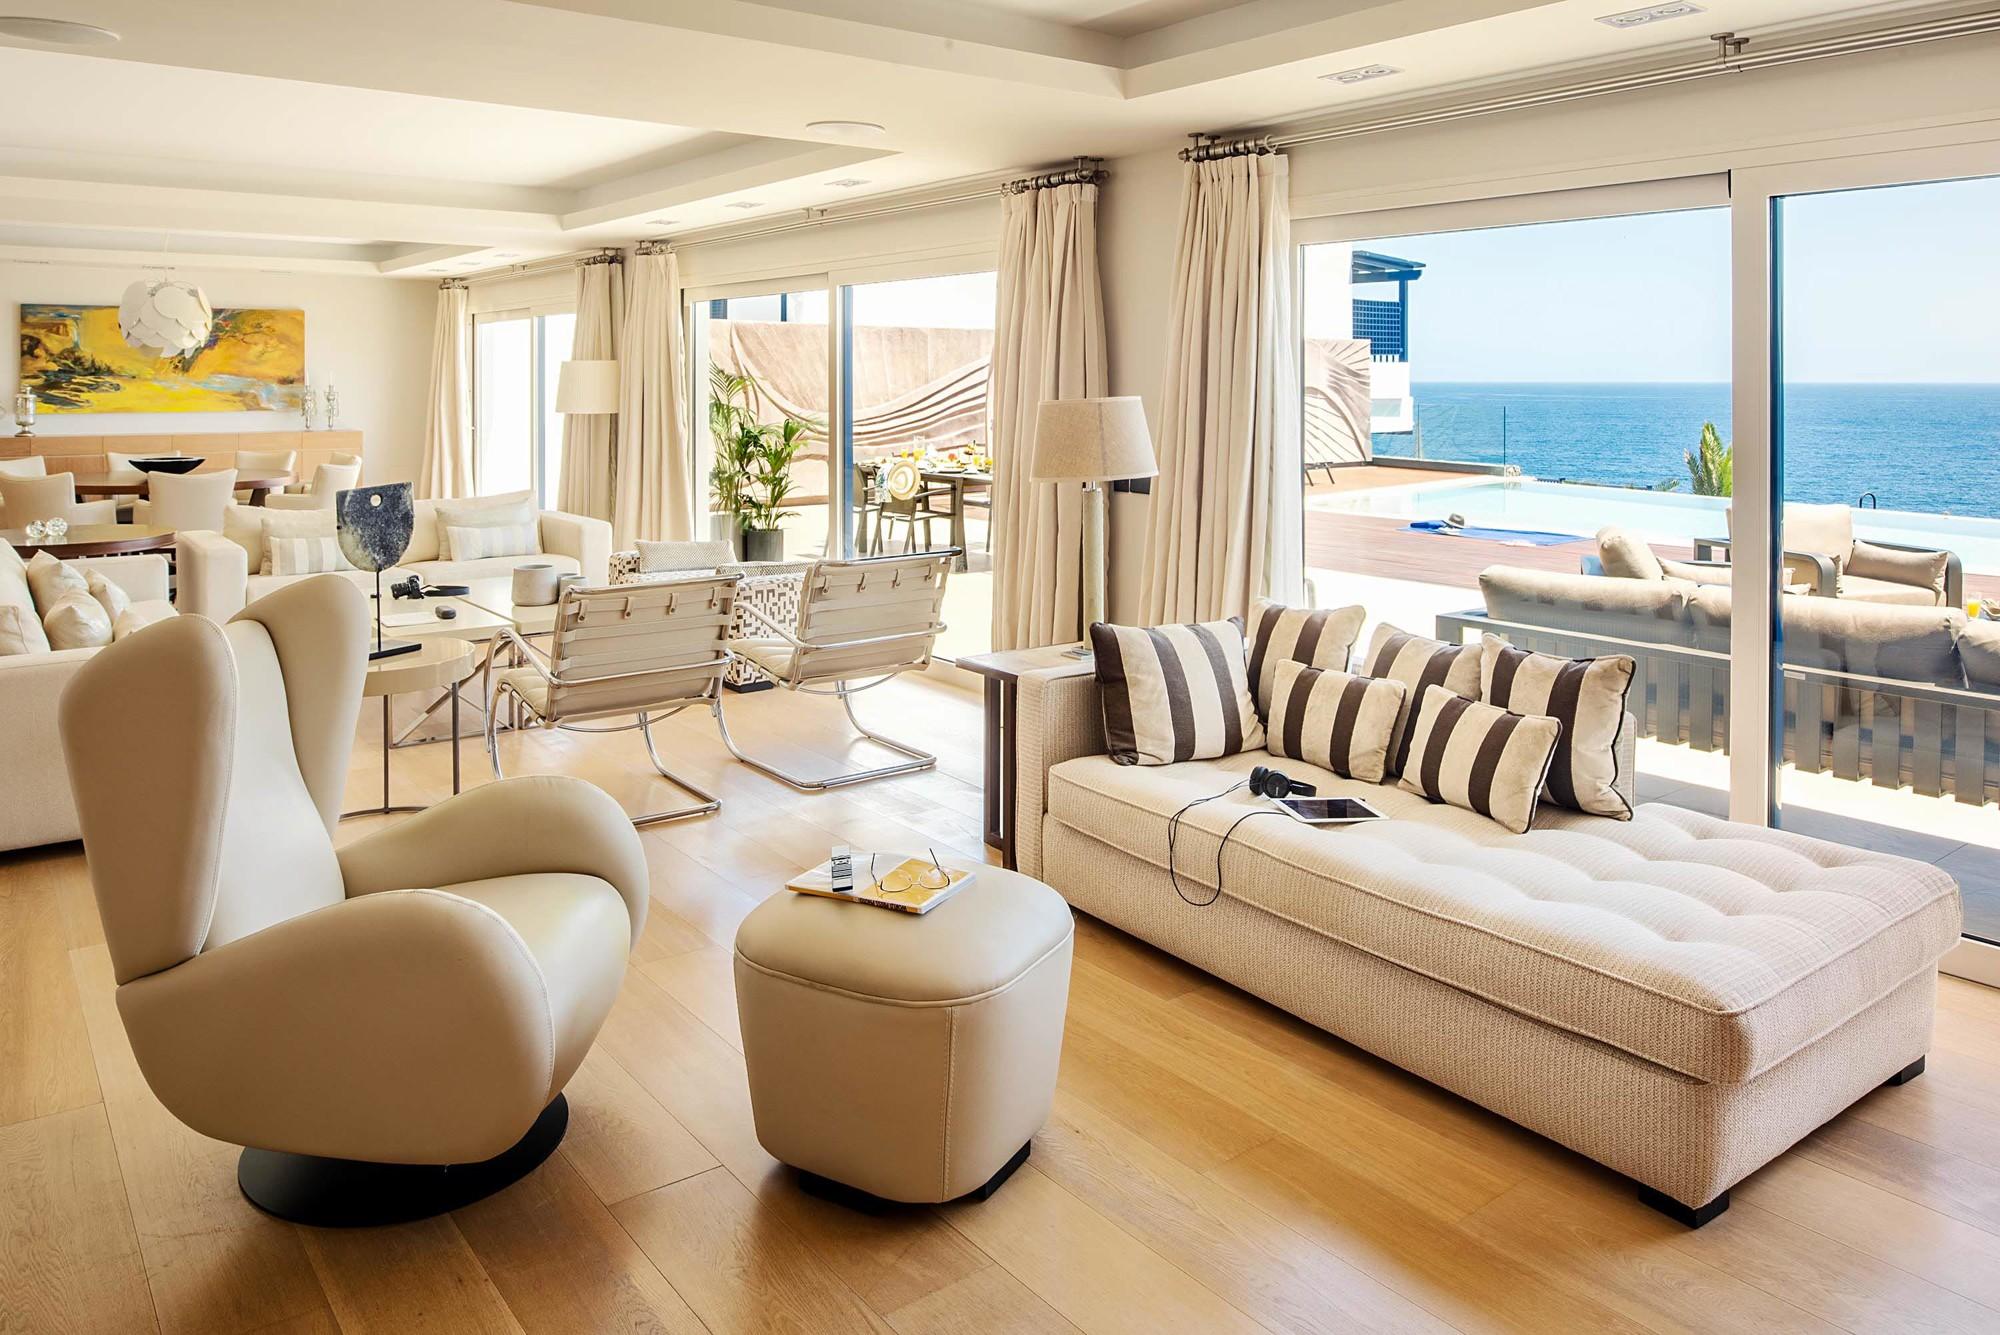 villa_serenity_luxury_bruto_005